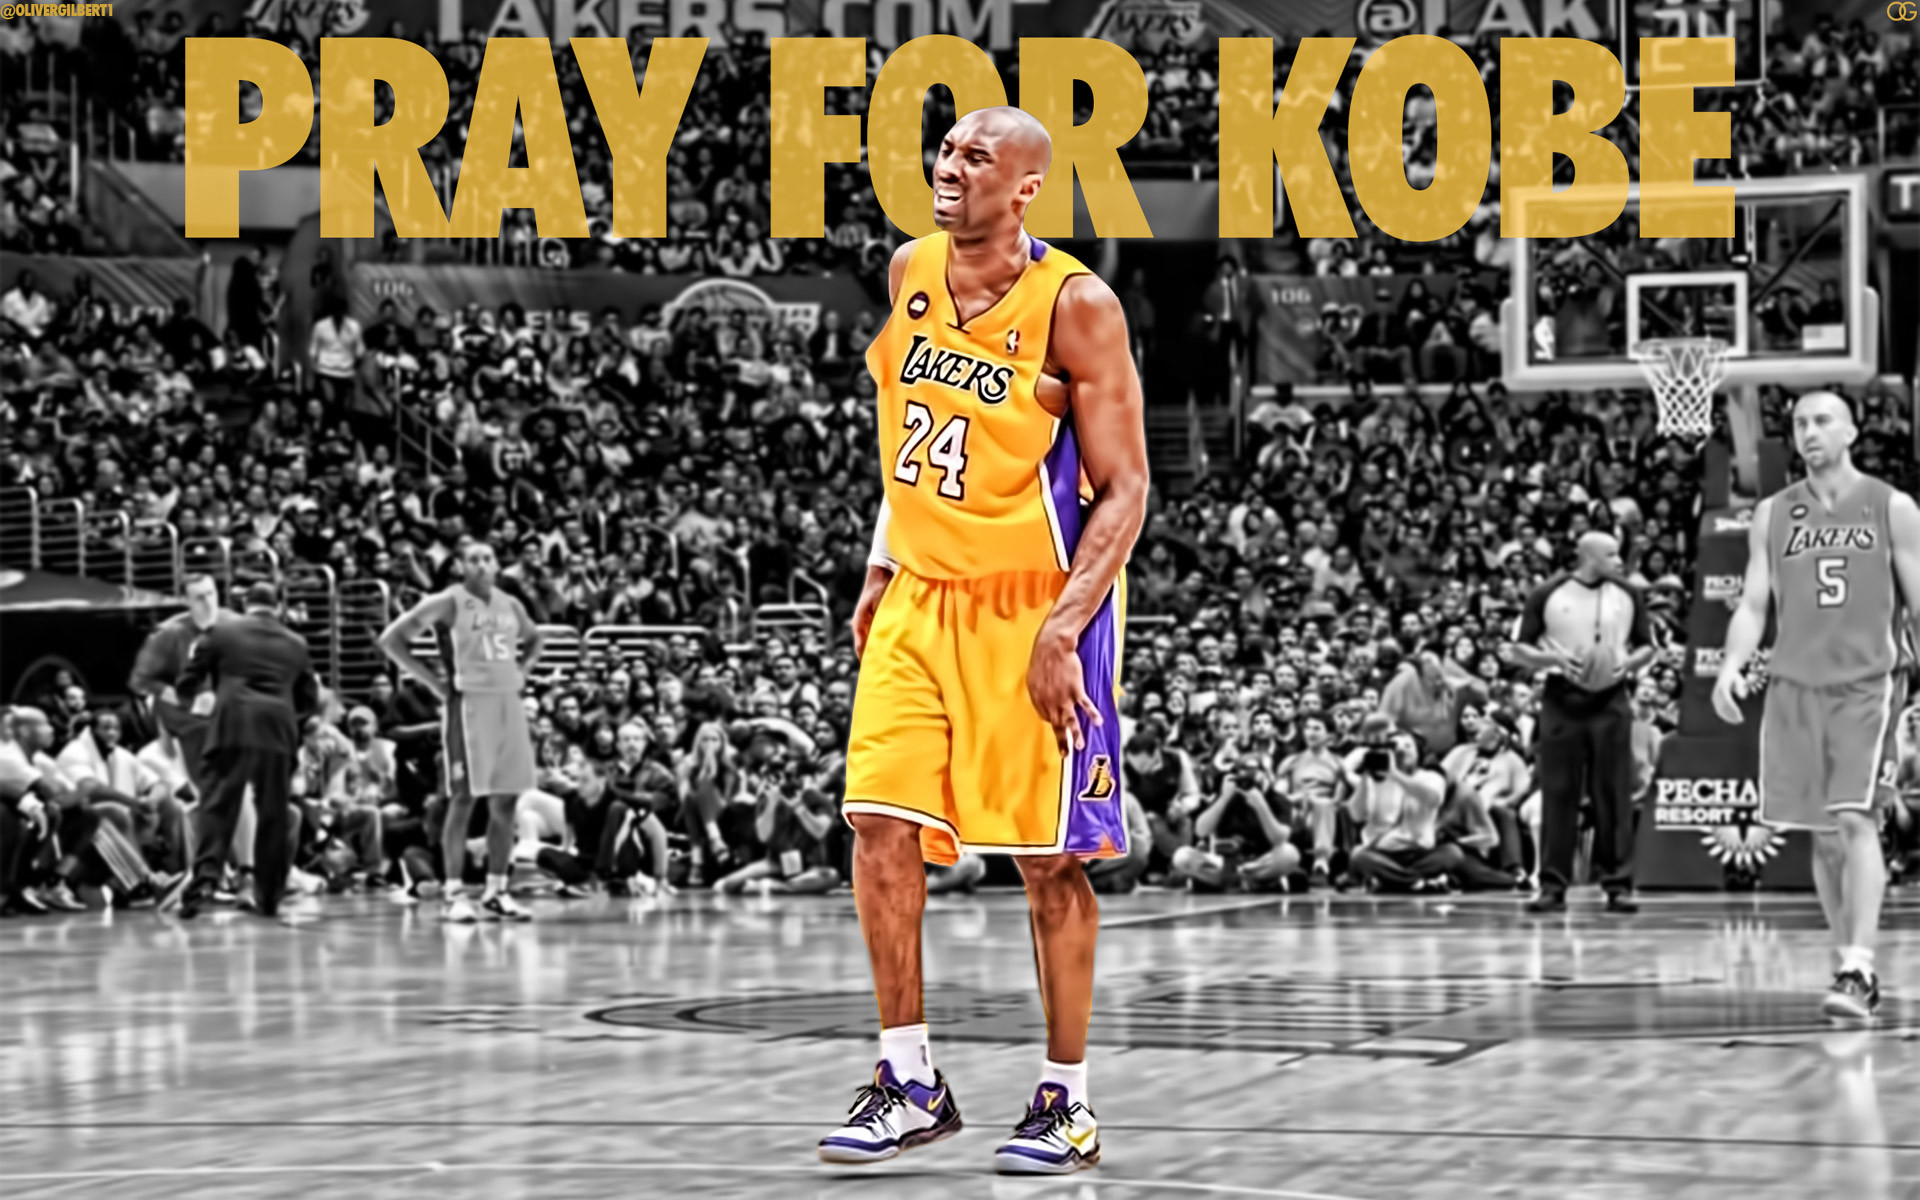 Kobe Bryant Pray For Kobe 1920×1200 Wallpaper